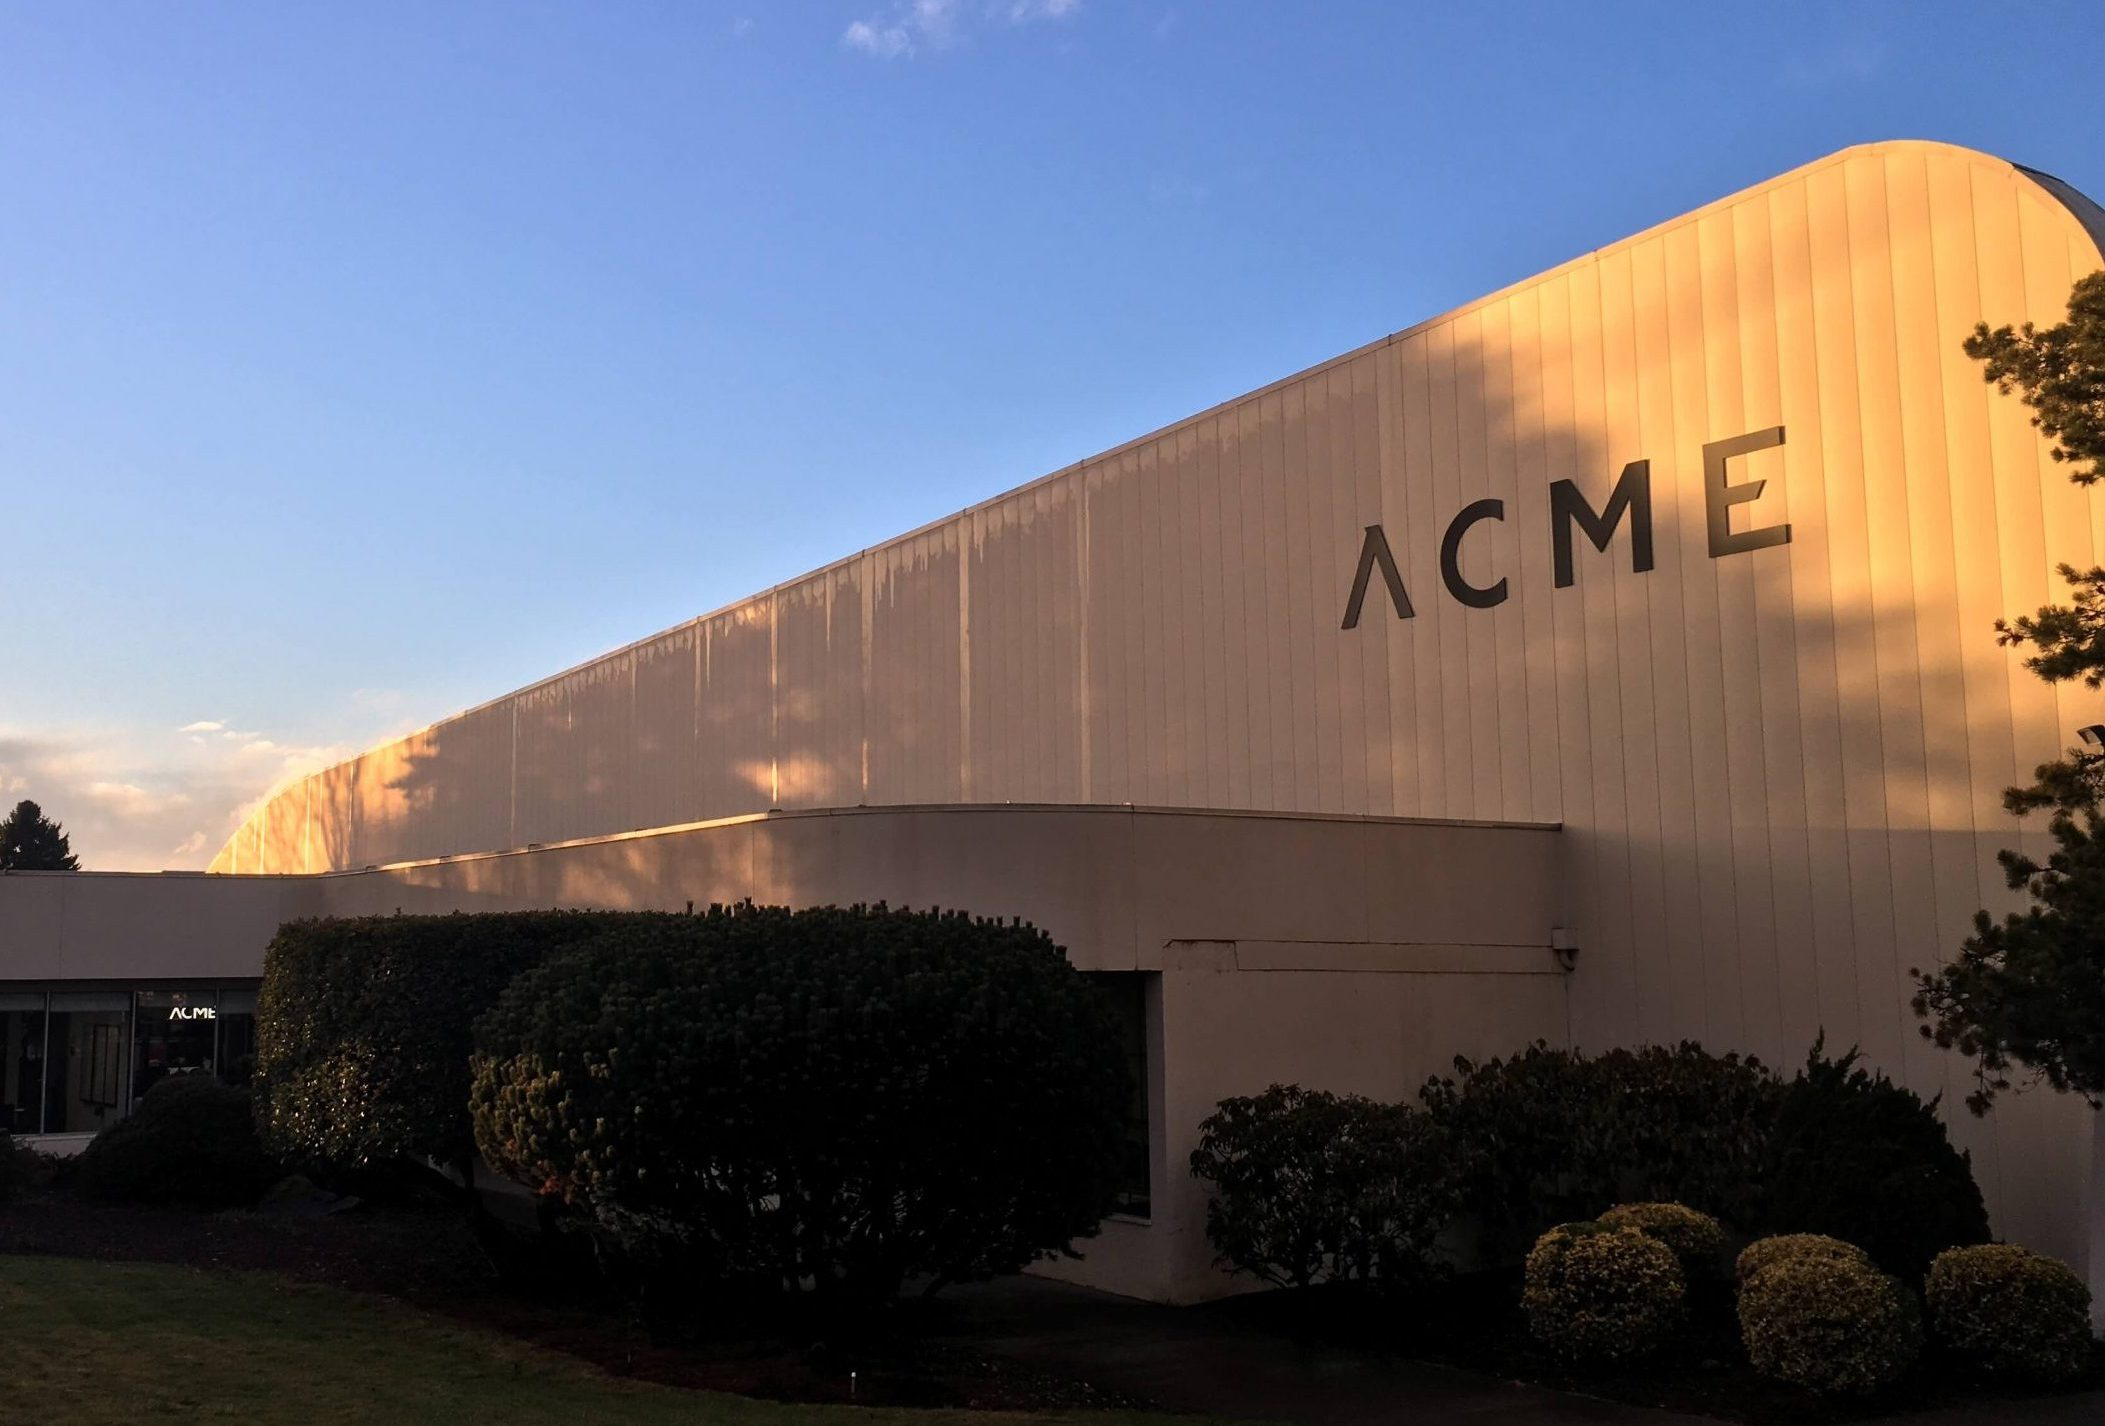 ACME Warehouse